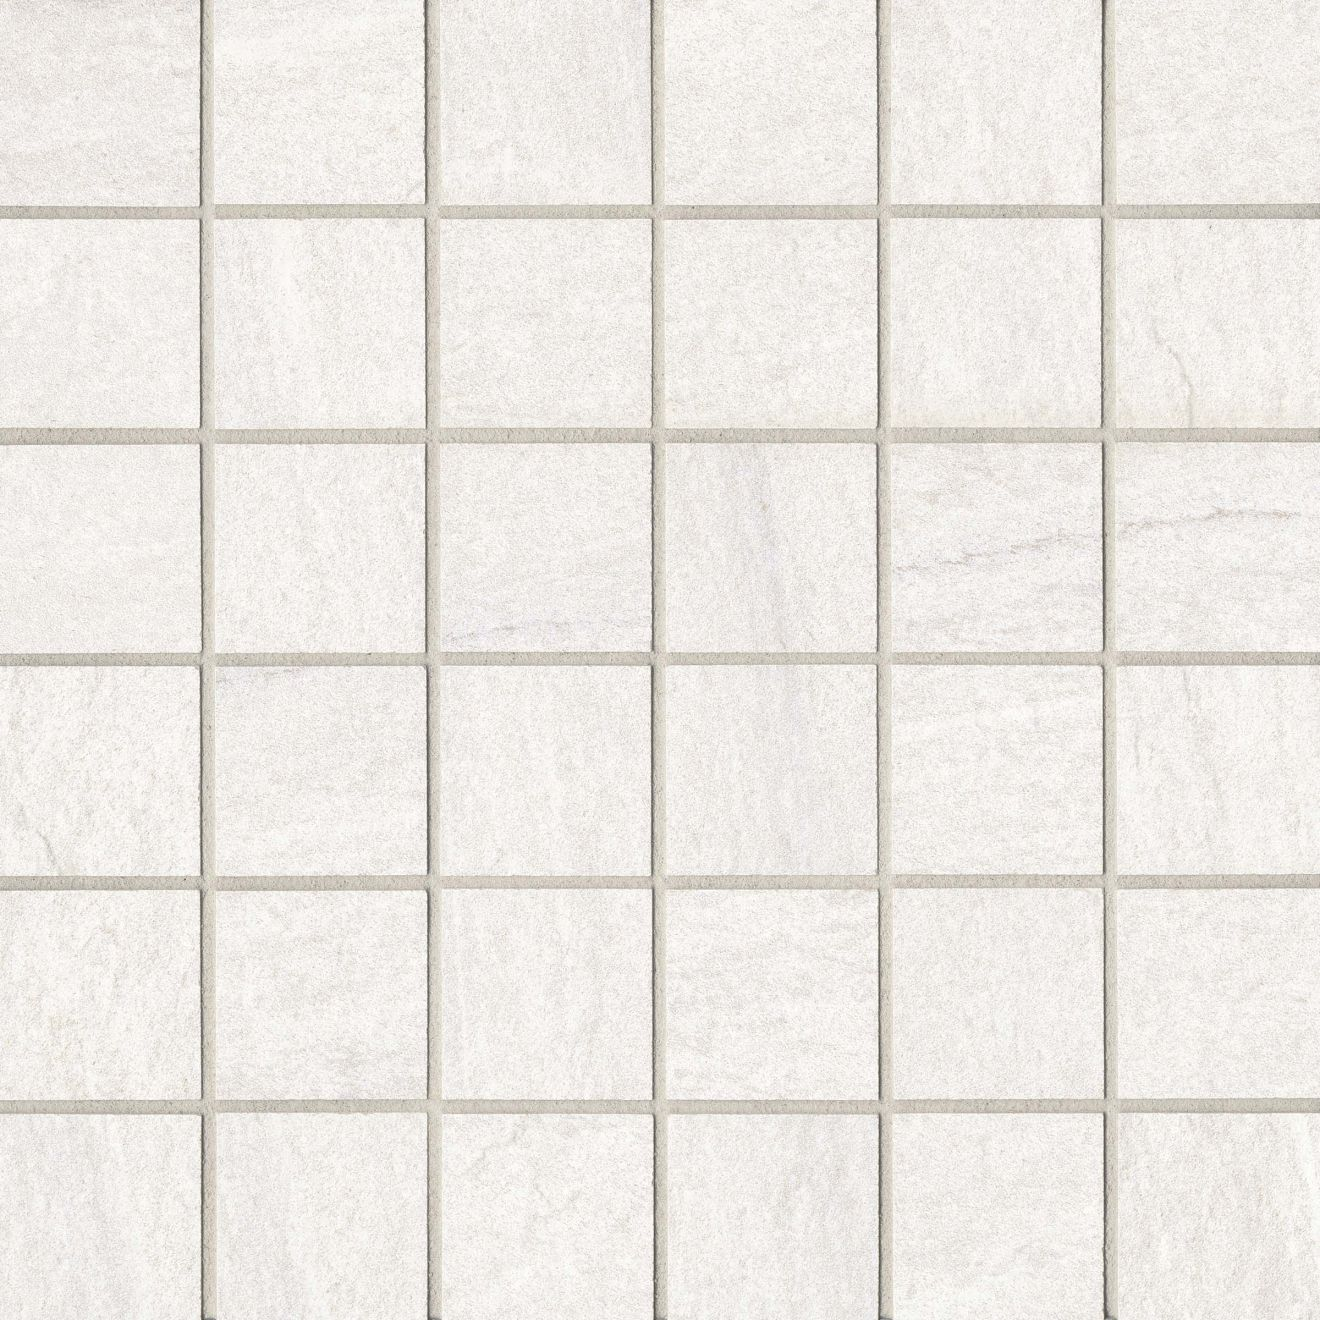 "Urban 2.0 2"" x 2"" Floor & Wall Mosaic in Nova White"